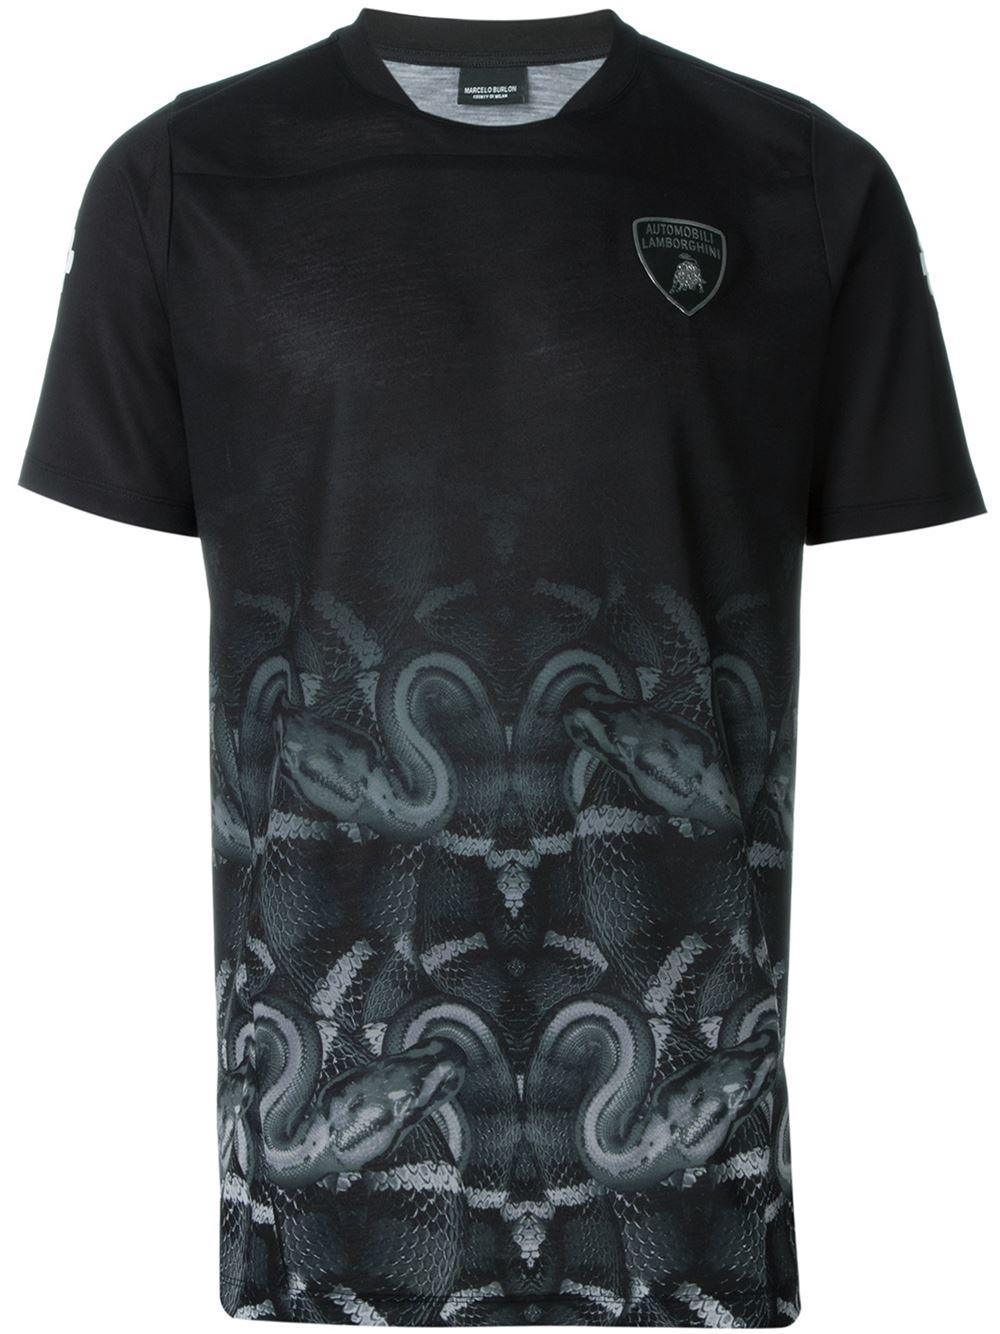 marcelo burlon lamborghini t shirt in black for men lyst. Black Bedroom Furniture Sets. Home Design Ideas